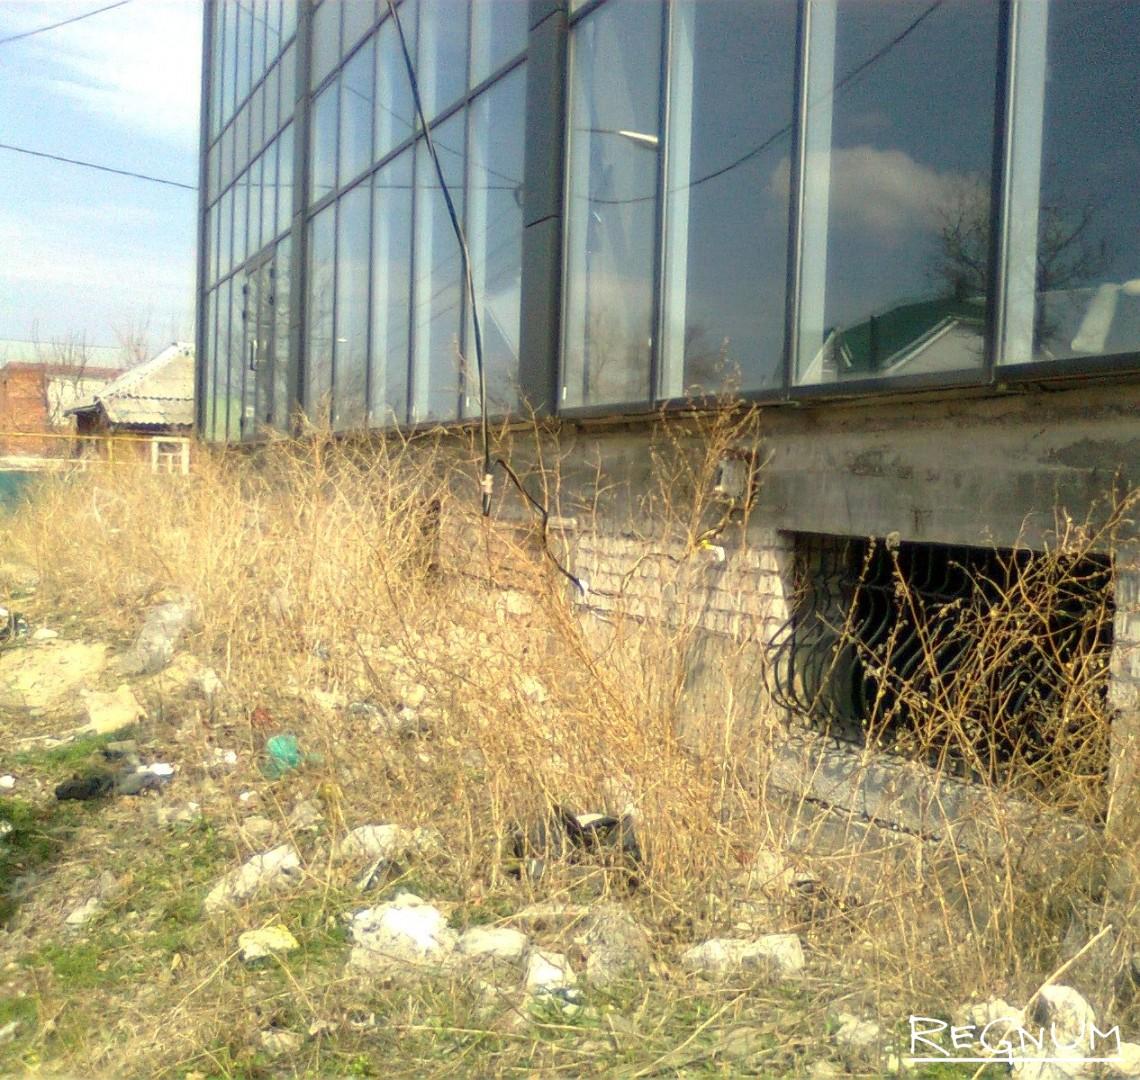 Новостройки за зиму погрязли в бурьяне и мусоре